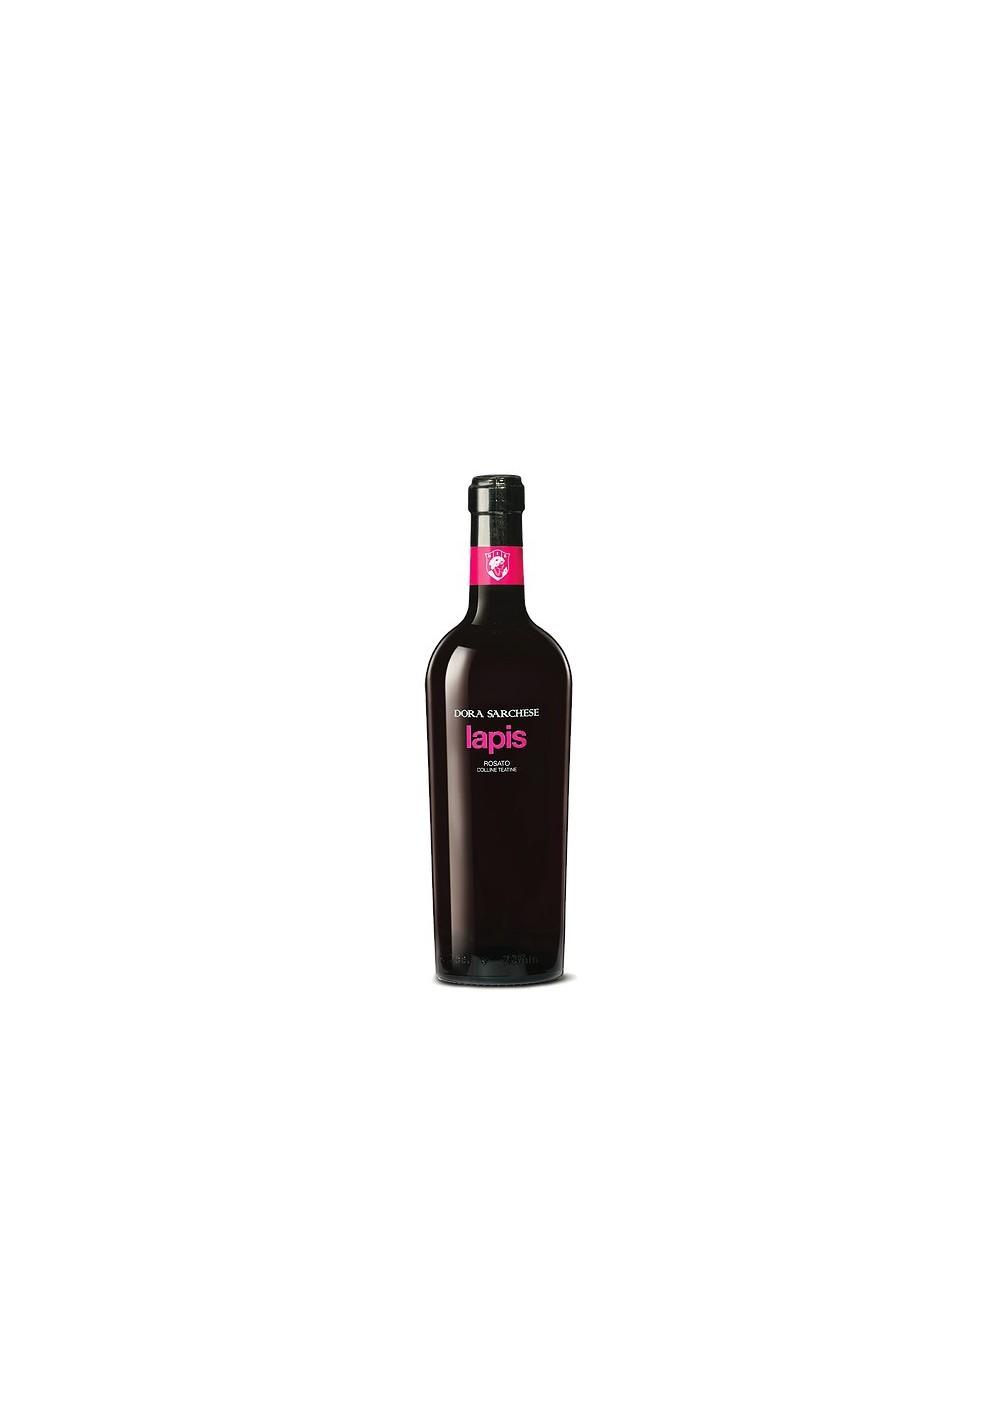 Lapis, Rosato Colline Teatine IGT 2014 - Sarchese Dora